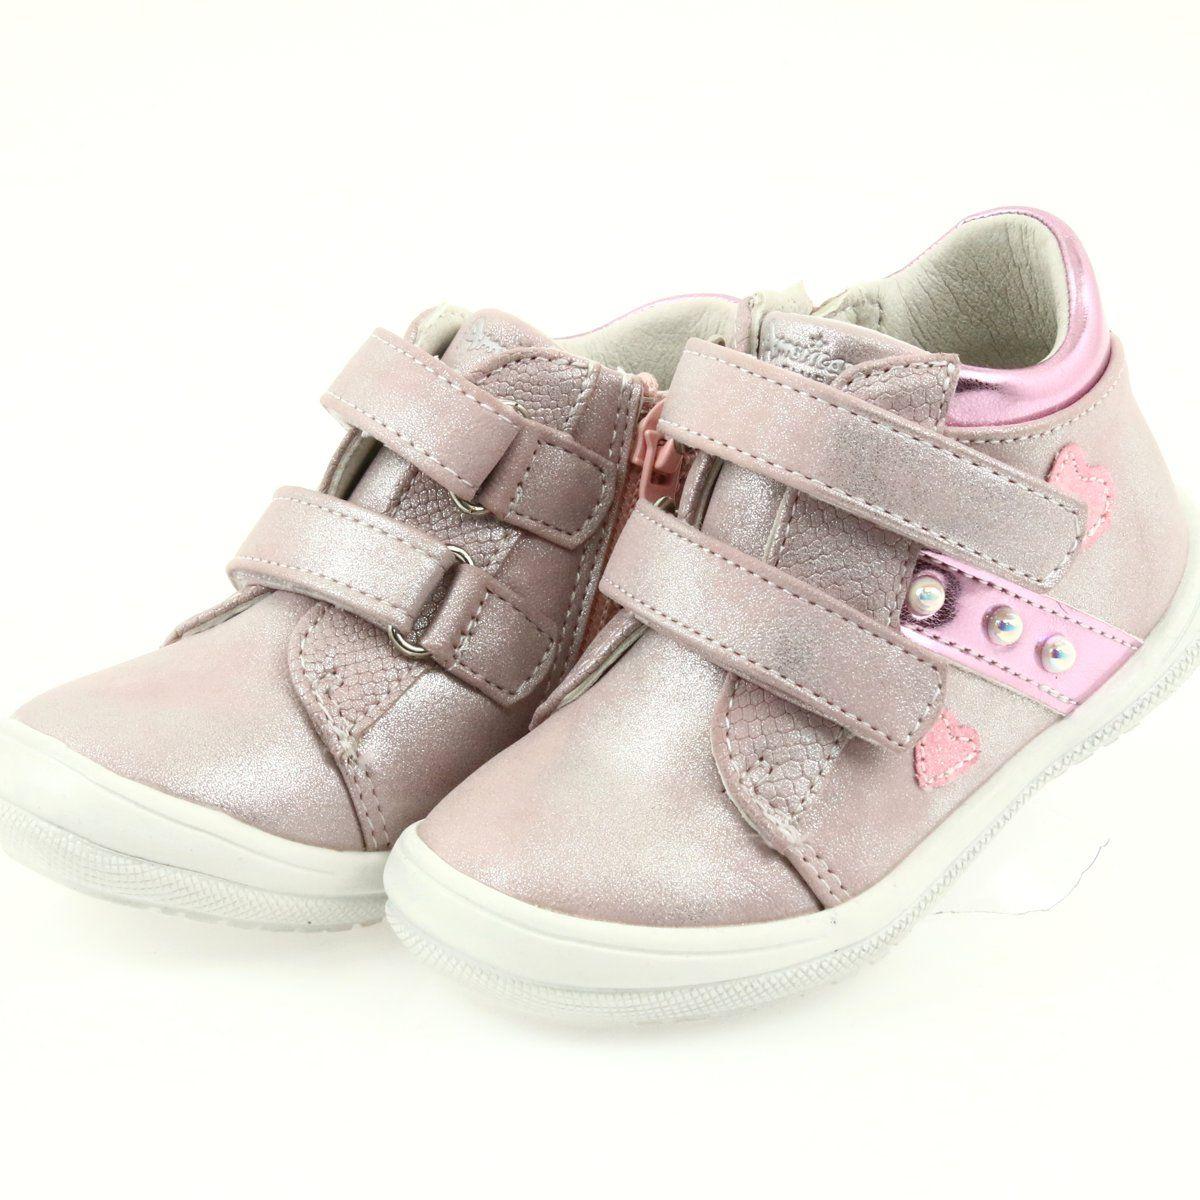 American Club Adi Sportowe Buty Dzieciece W Serduszka American Szare Rozowe Shoes Baby Shoes Wedge Sneaker